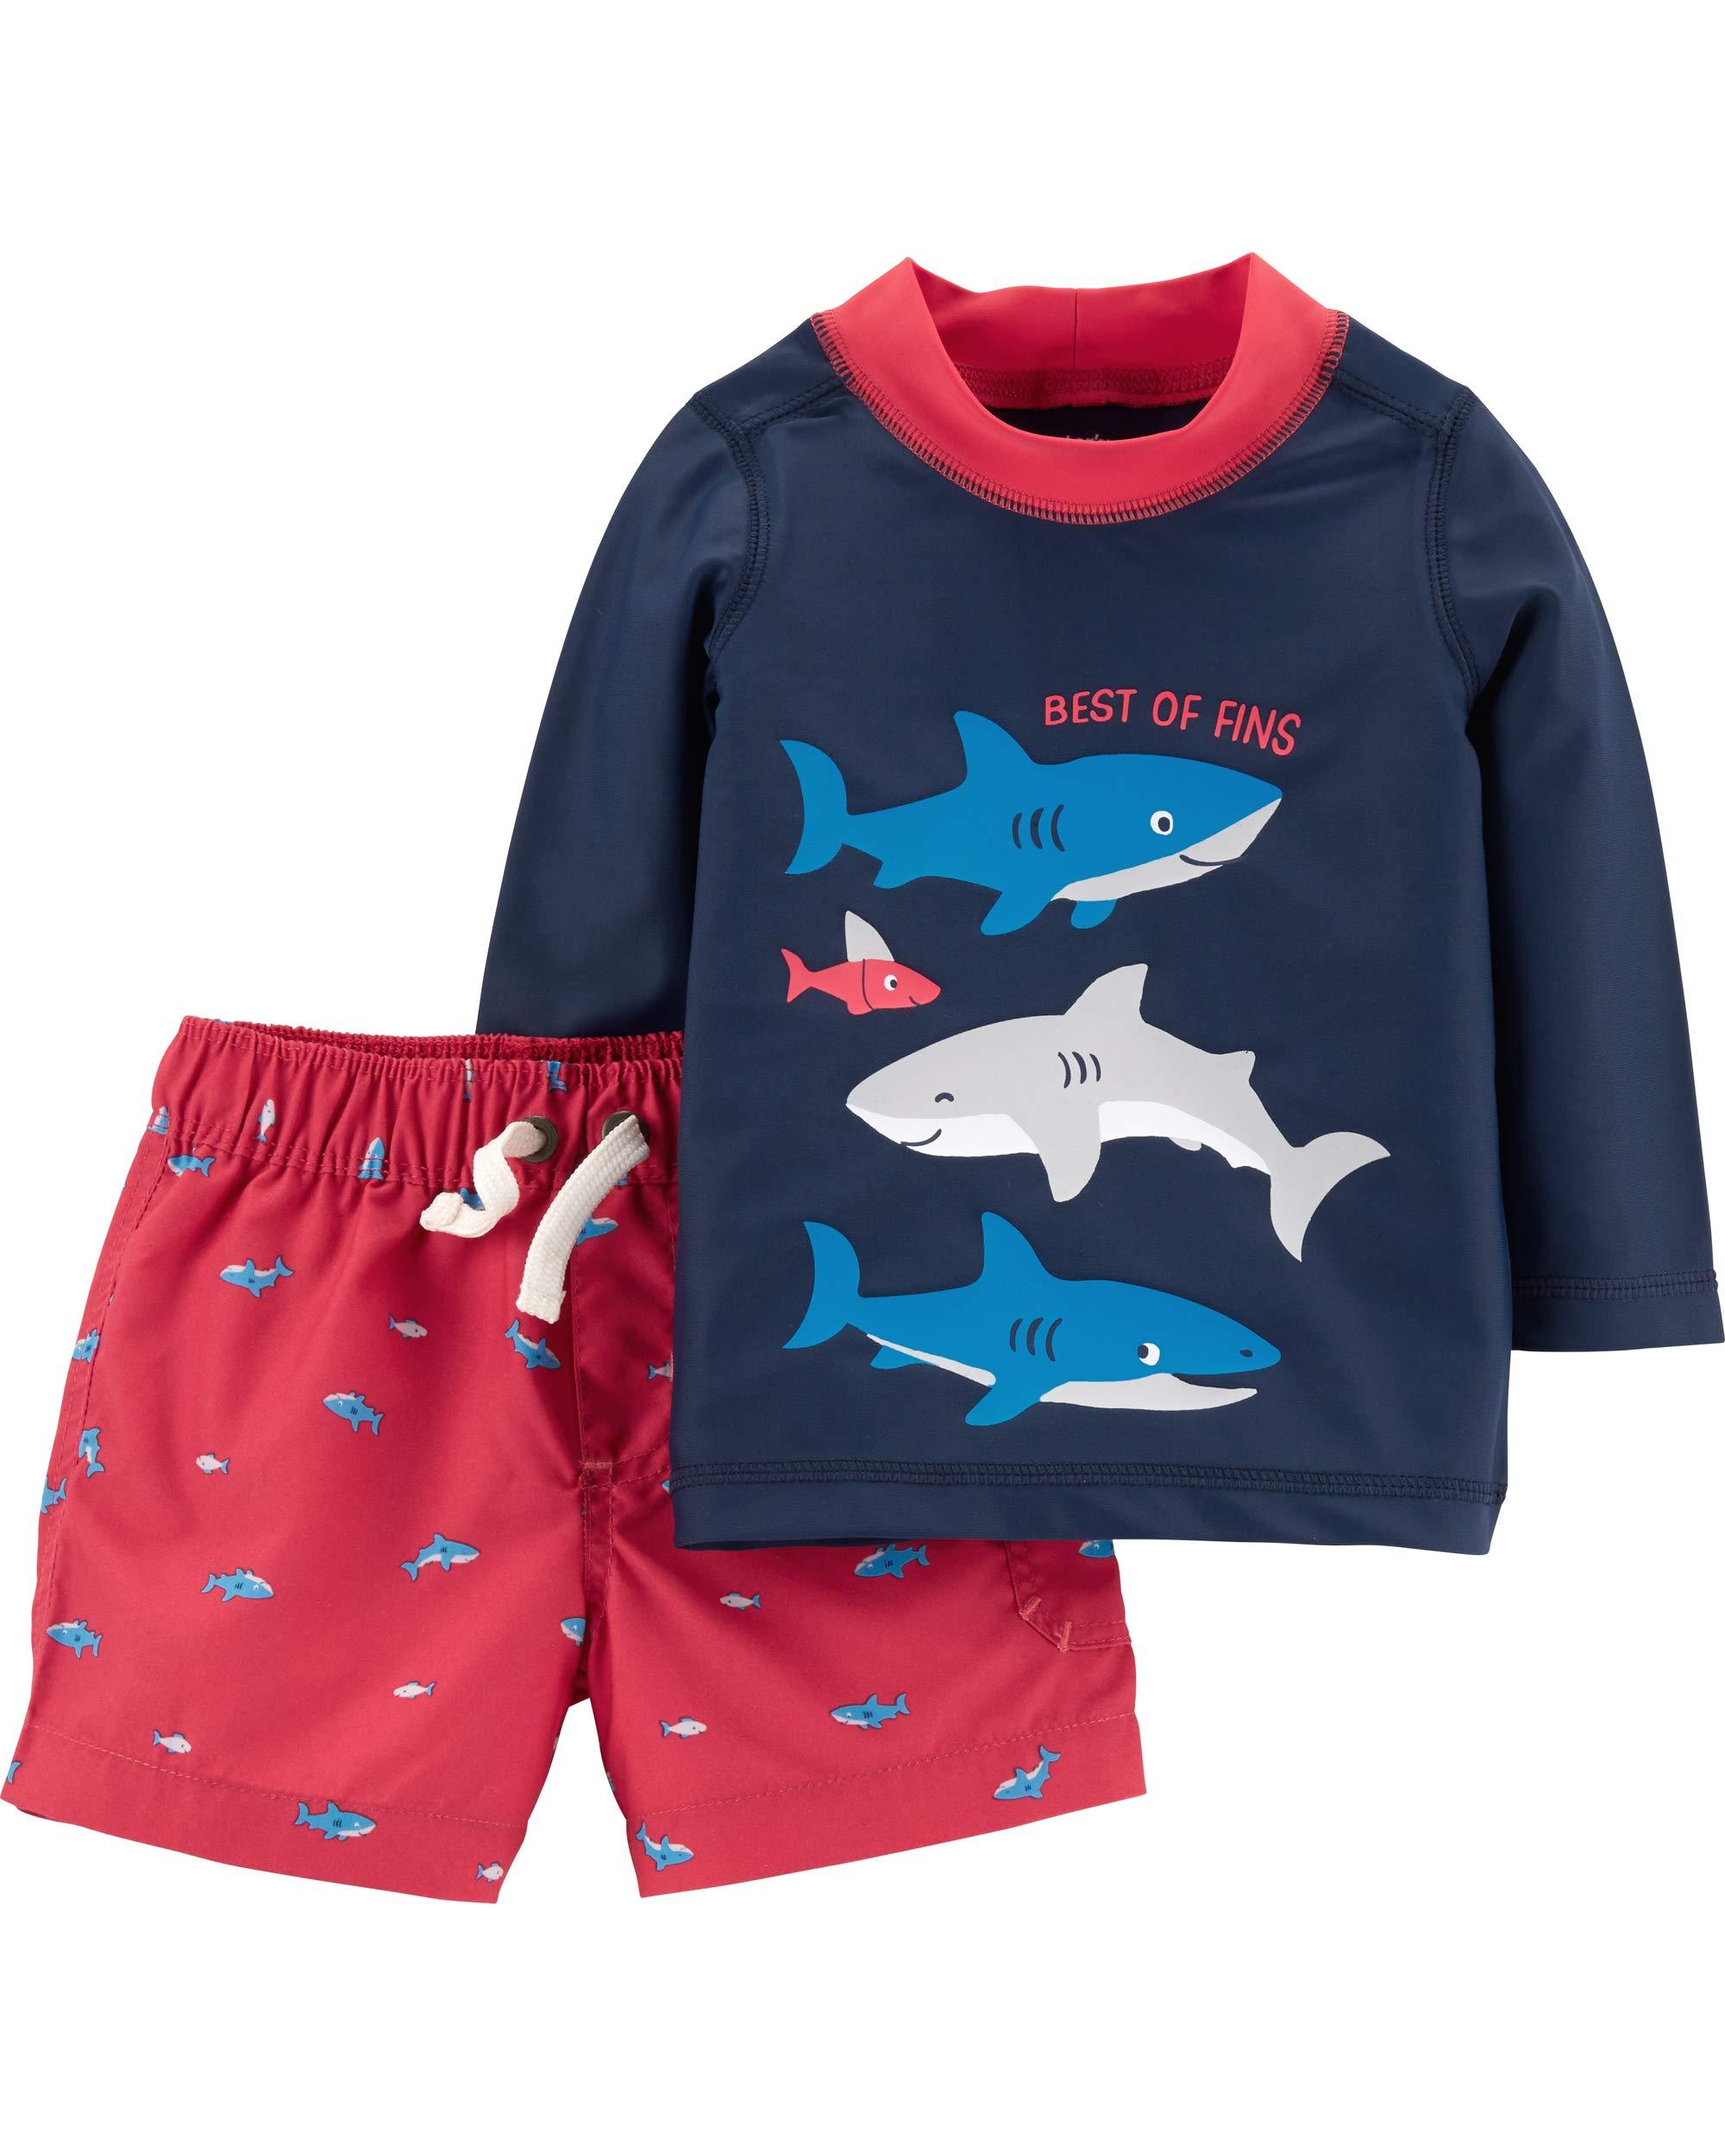 Carter's Baby Boys Rashguard Swim Set, Shark, 3 Months by Carter's